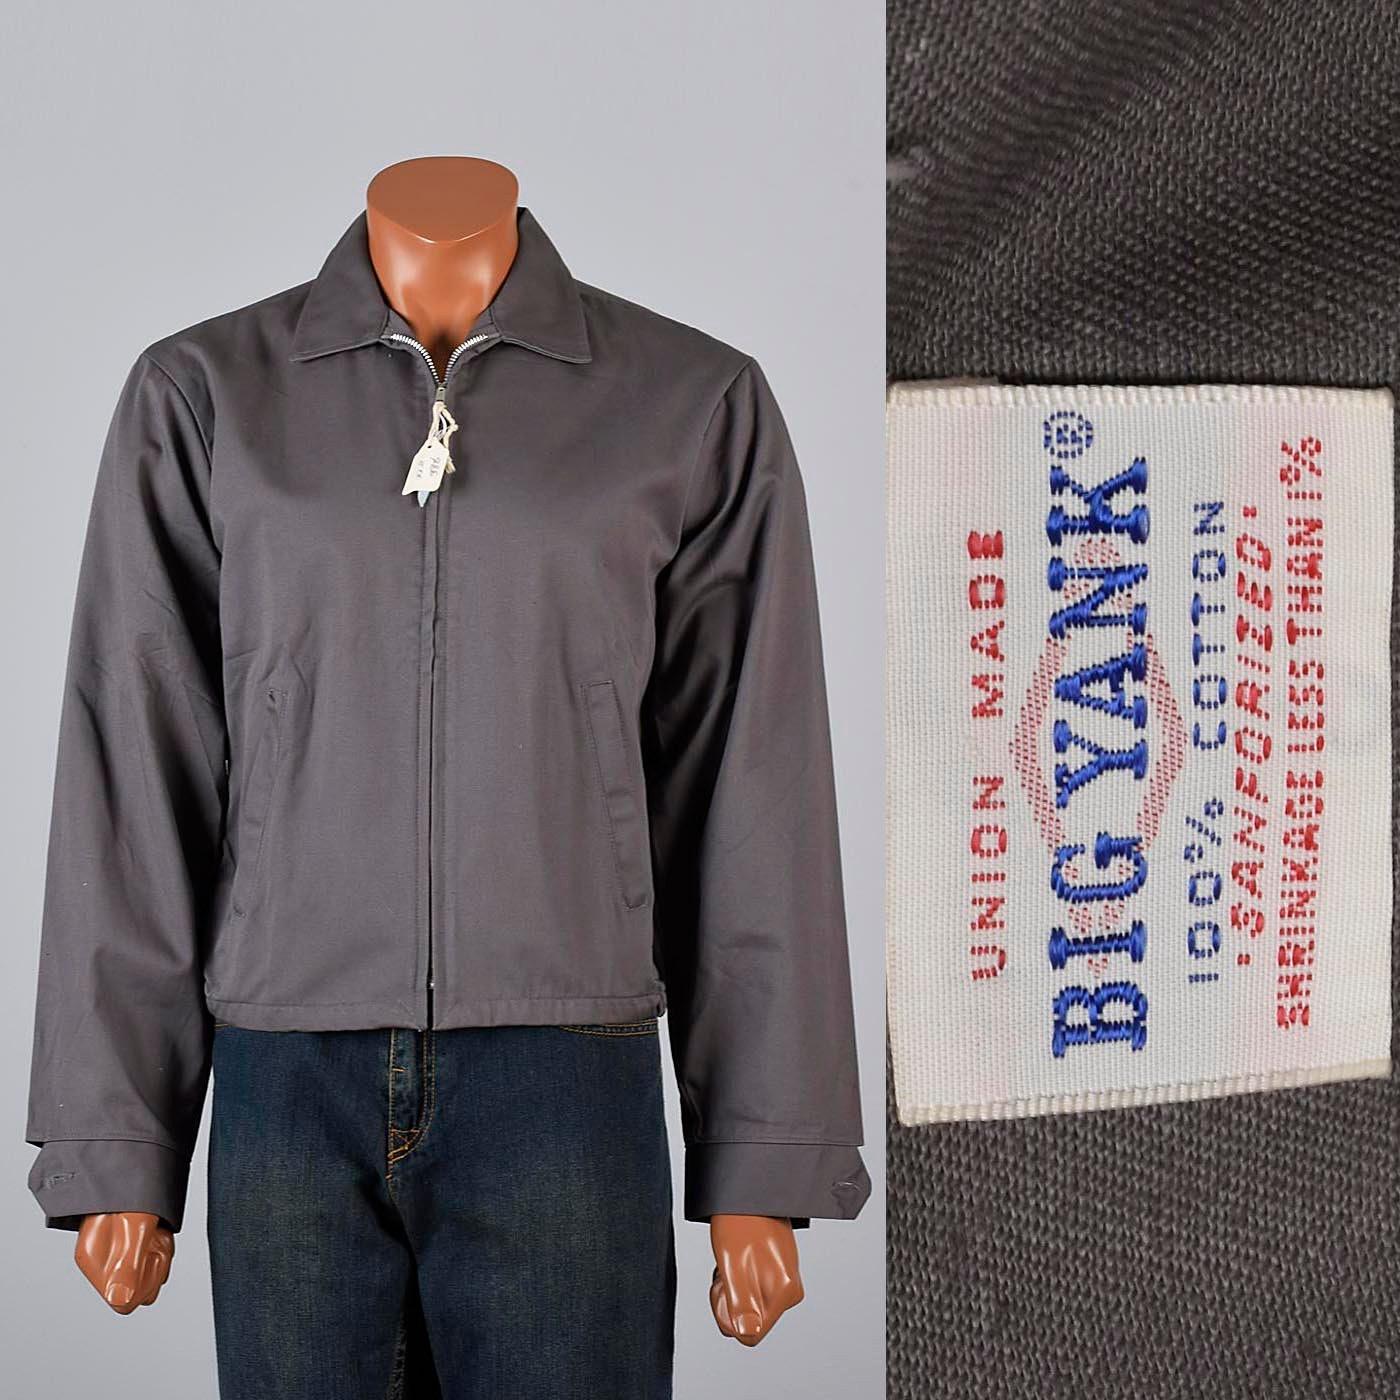 1950s Mens Hats | 50s Vintage Men's Hats Deadstock Jacket 50S Sanforized Cotton Big Yank Workwear Mens Casual Gray Metal Zip 100 Twill $0.00 AT vintagedancer.com